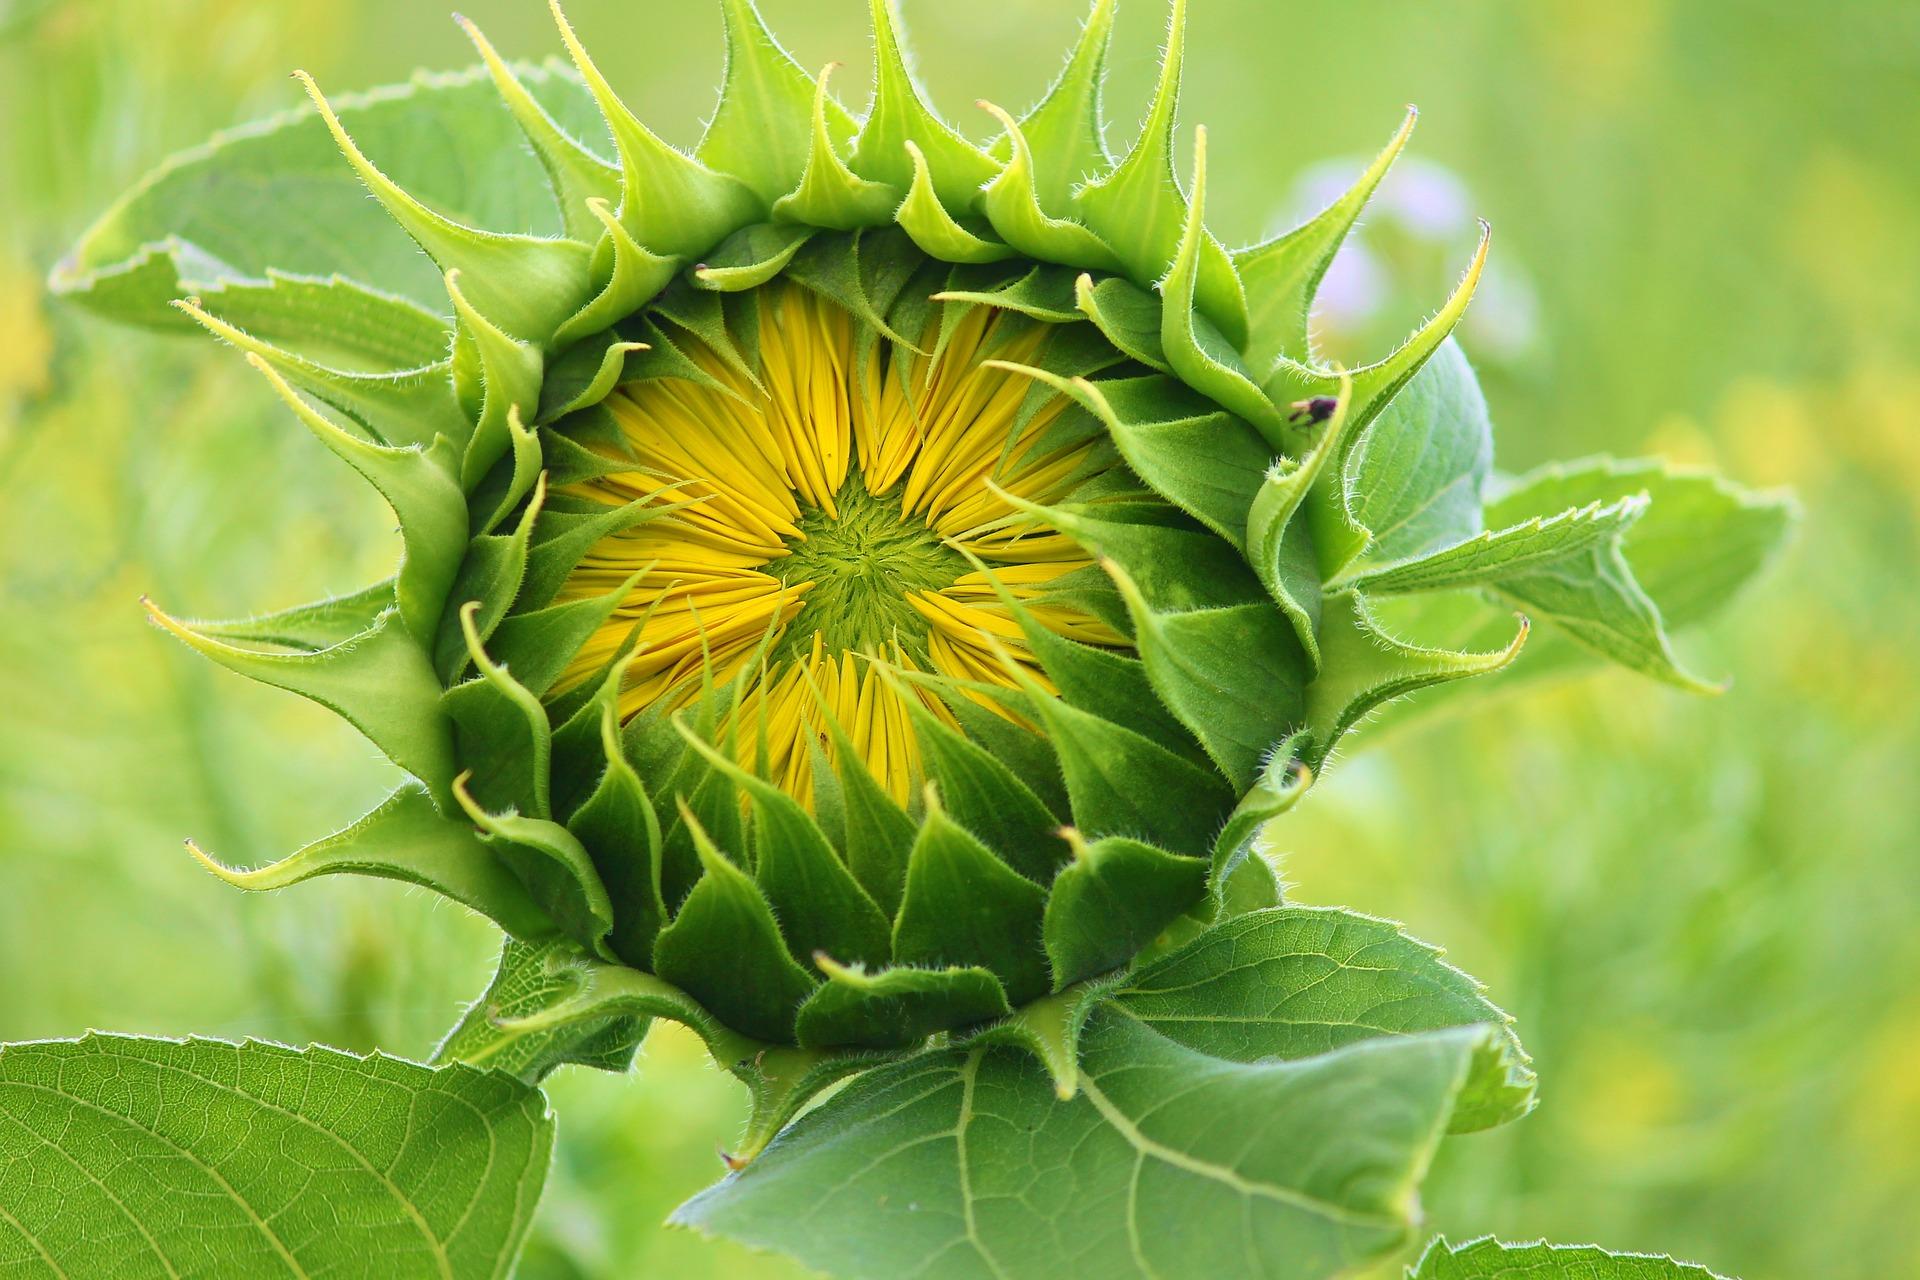 sunflower-3536155_1920